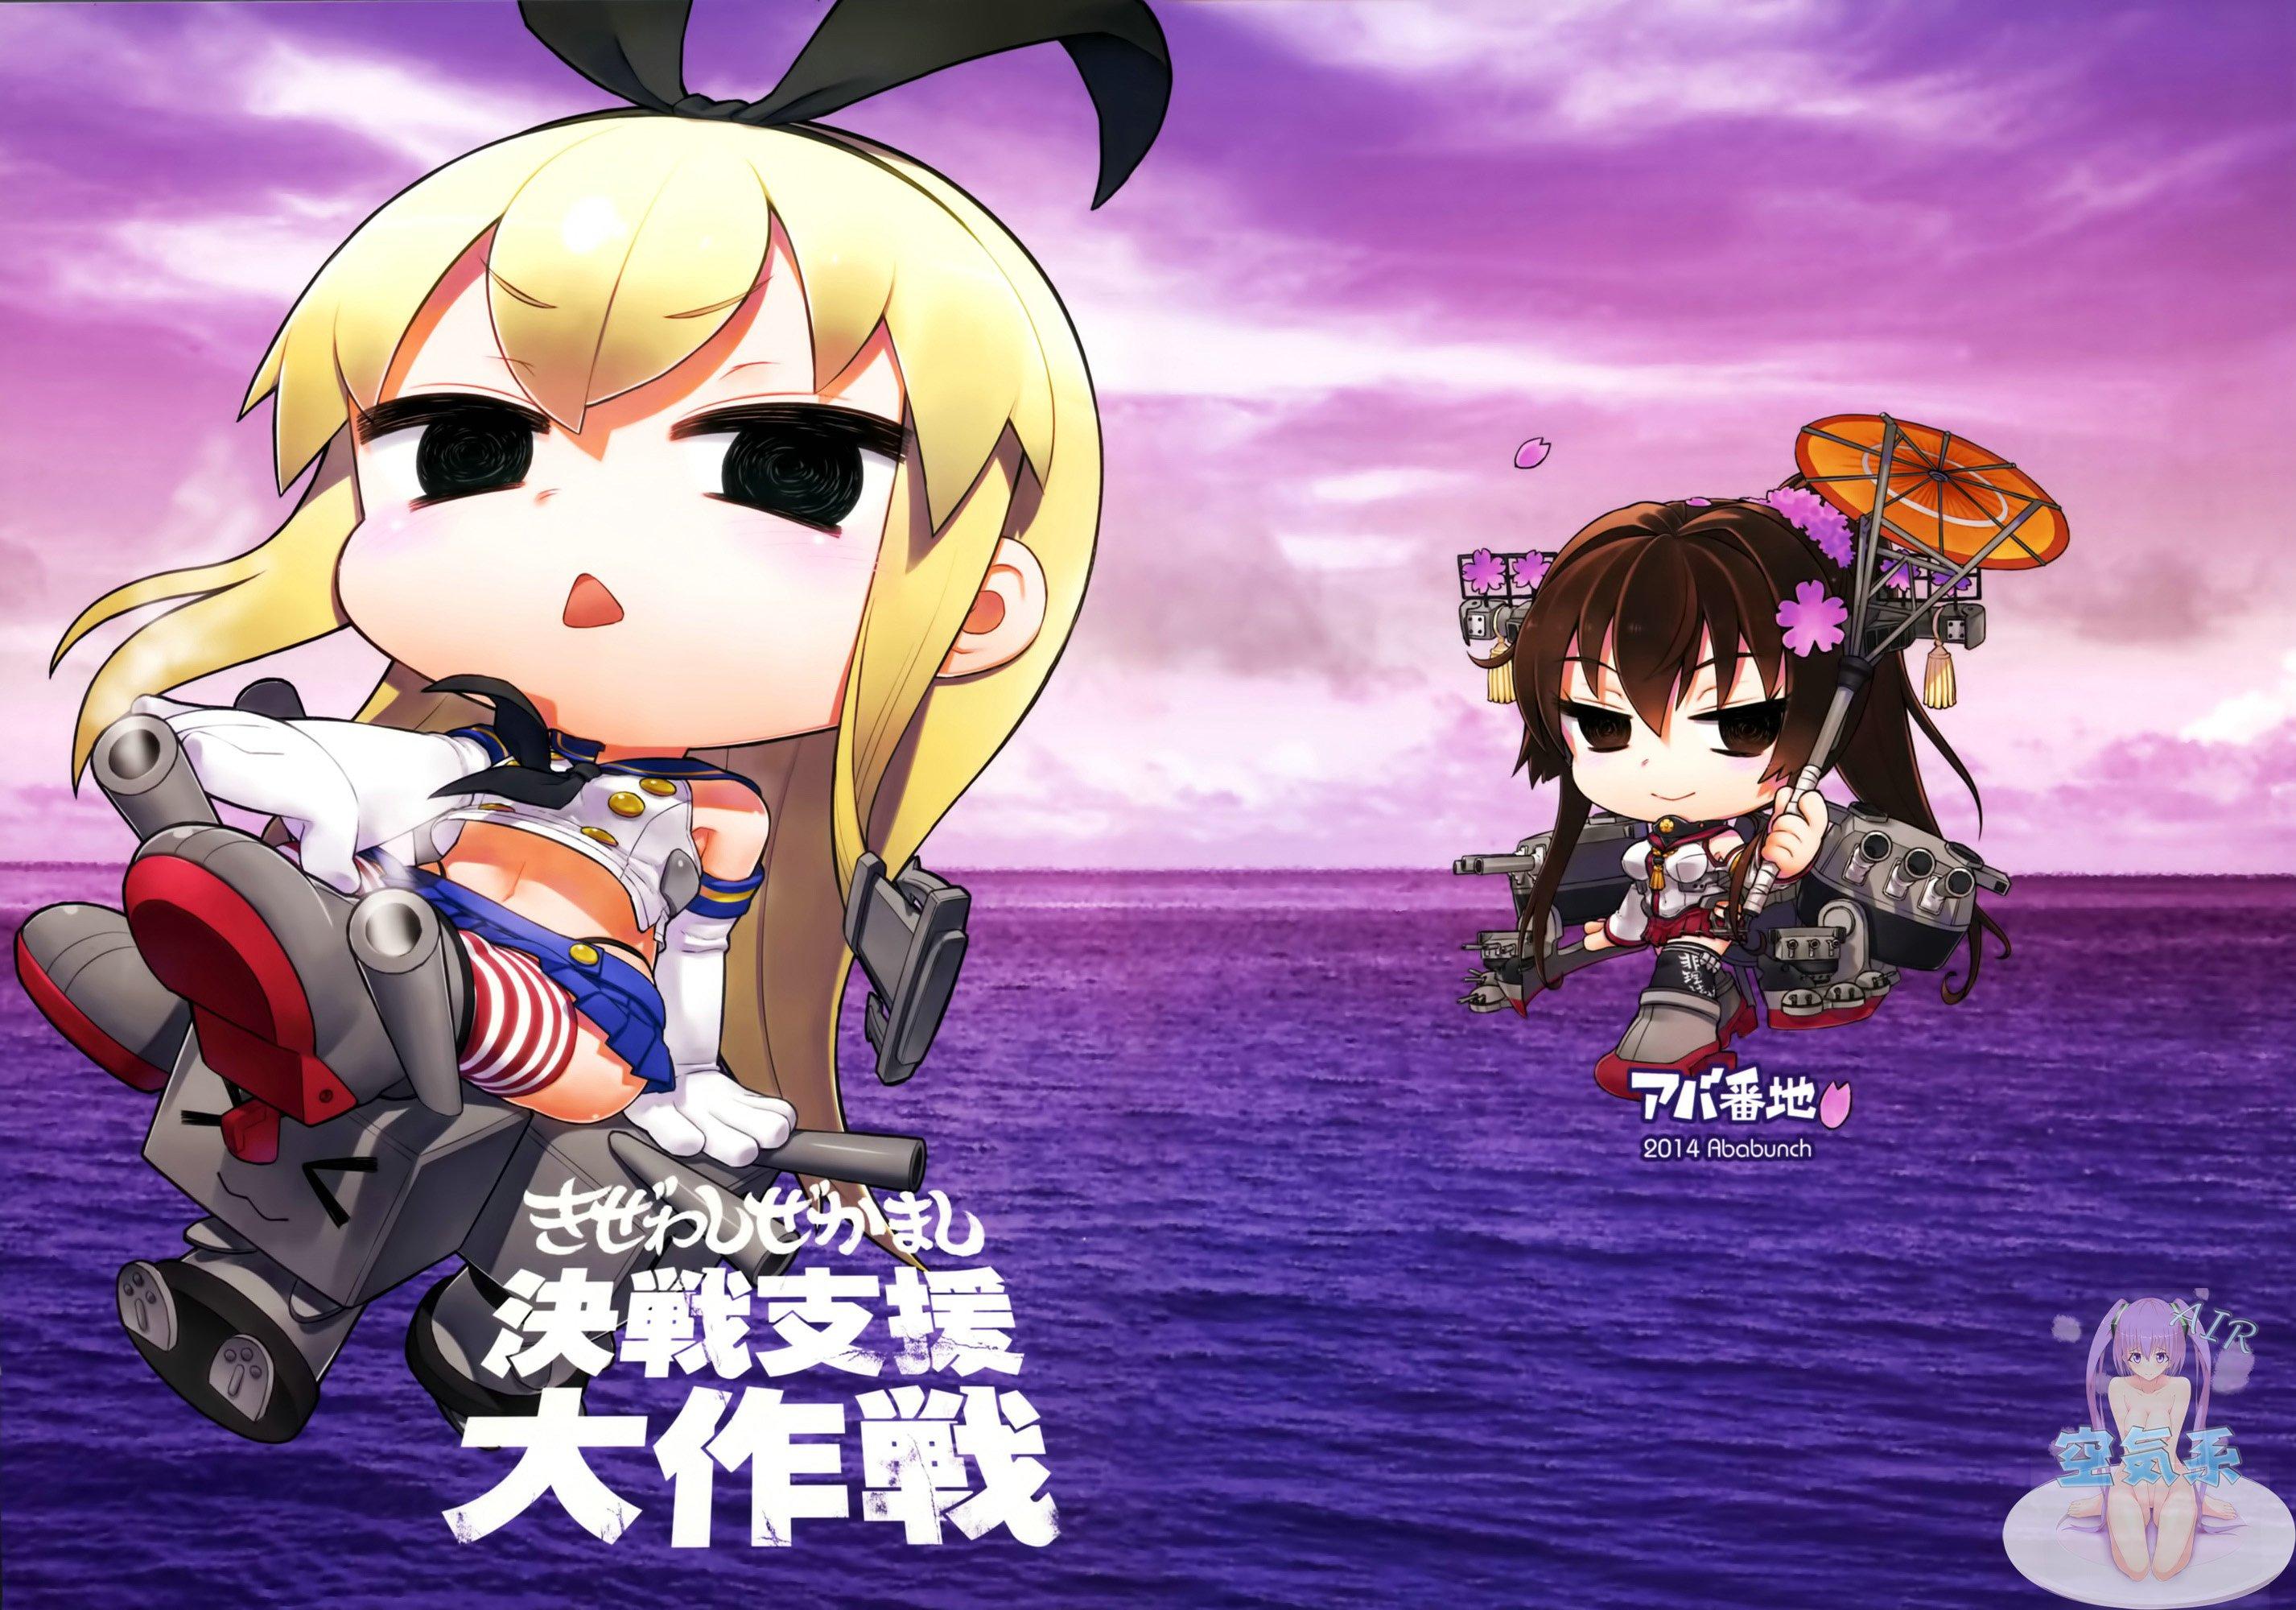 【R0014】舰娘汉化合集 第二弹(120本,3.3G)